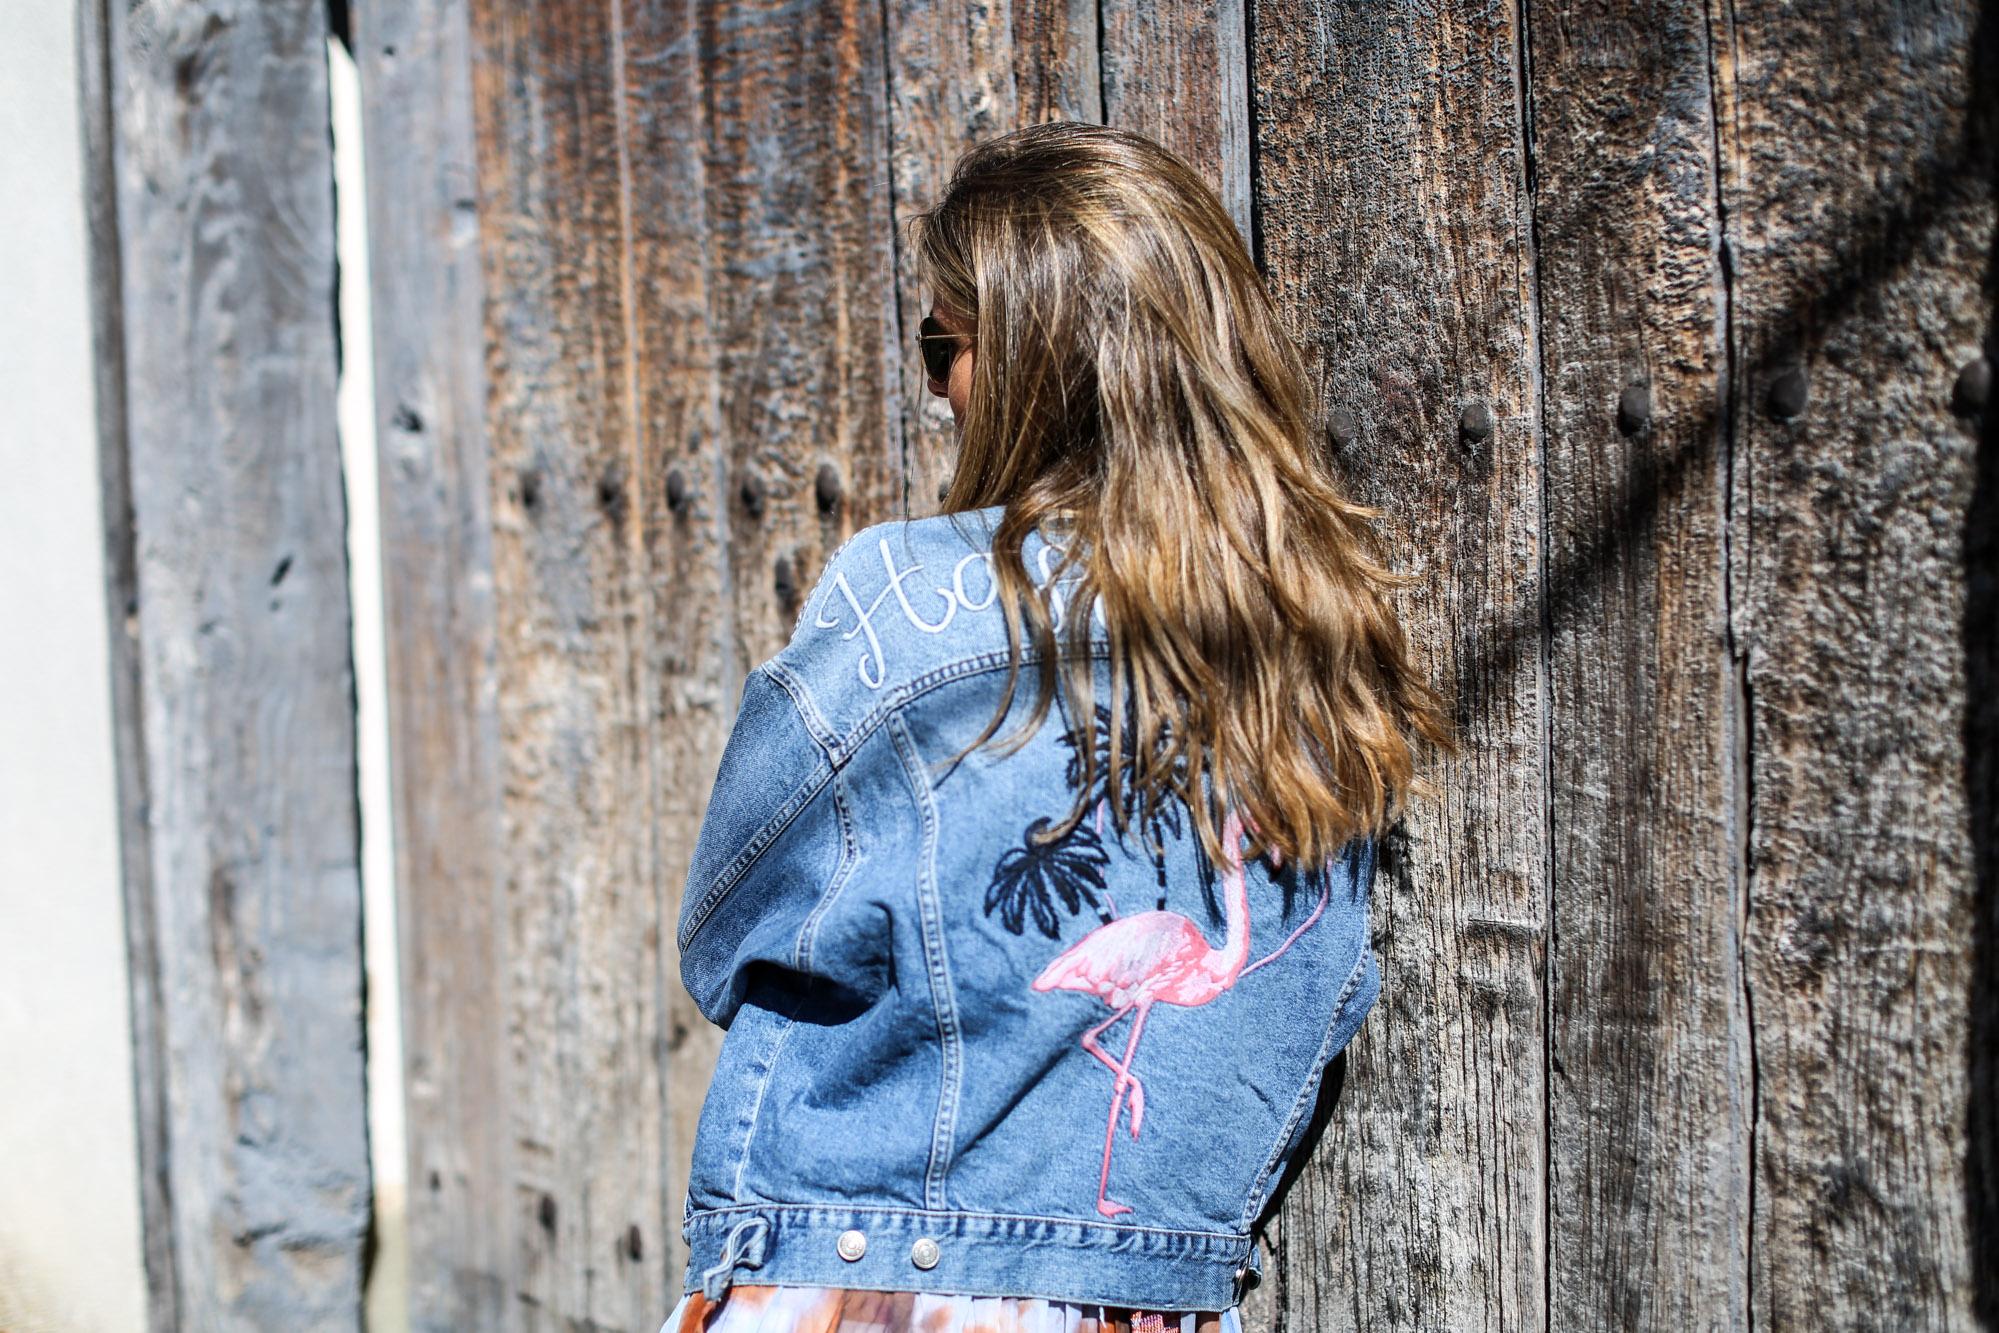 clochet_streetstyle_zara_boholongdress__pull&bear_flamingo_oversized_denimjacket-9